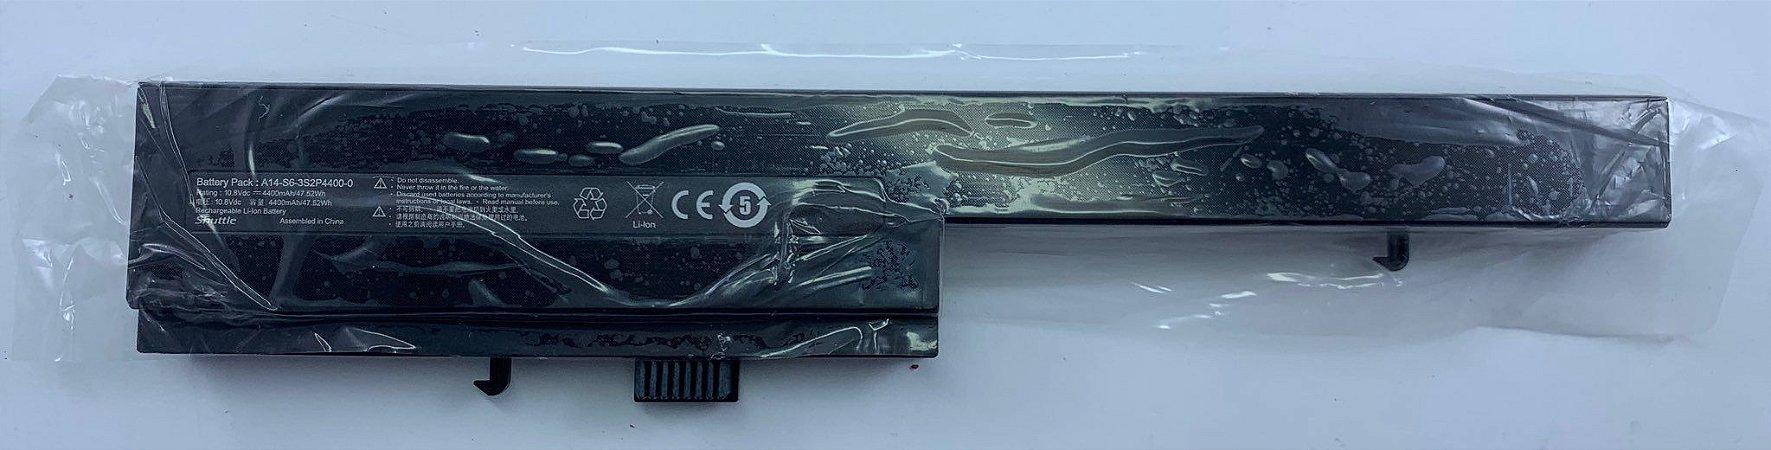 Bateria A14 56 352 P4400 -0 Para Positivo Unique N4200